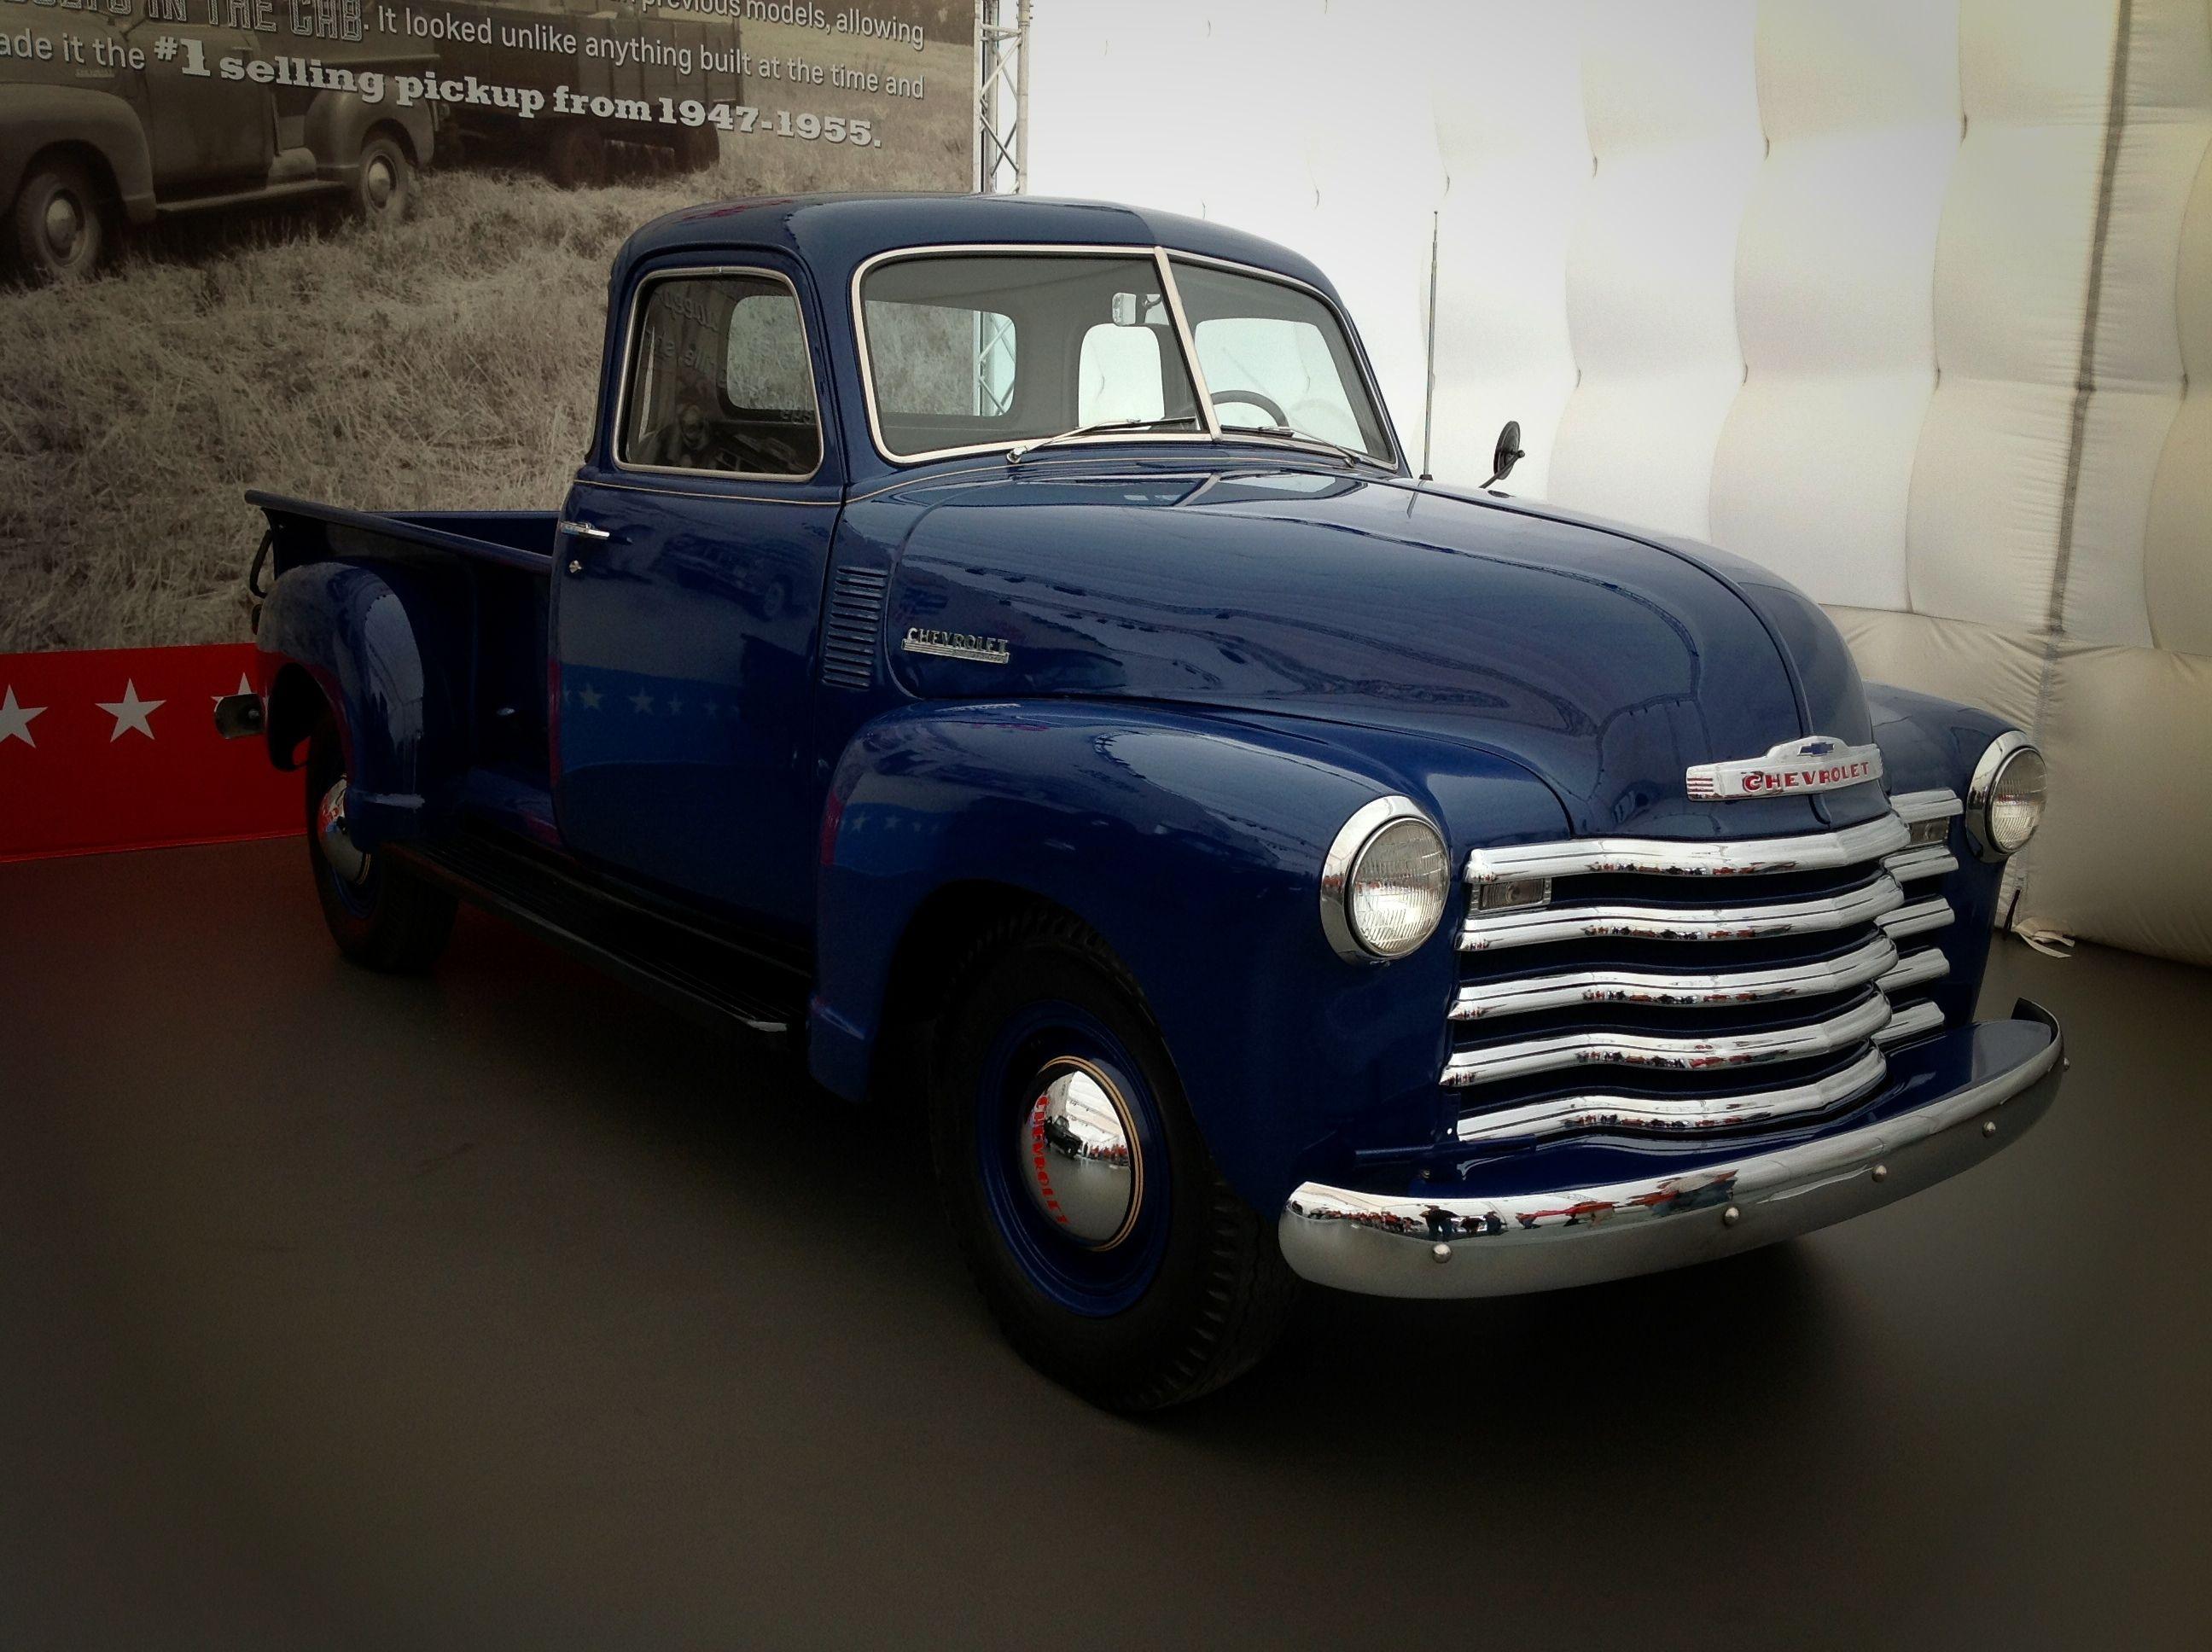 1953 chevrolet pickup truck antique trucks 2 pinterest. Black Bedroom Furniture Sets. Home Design Ideas